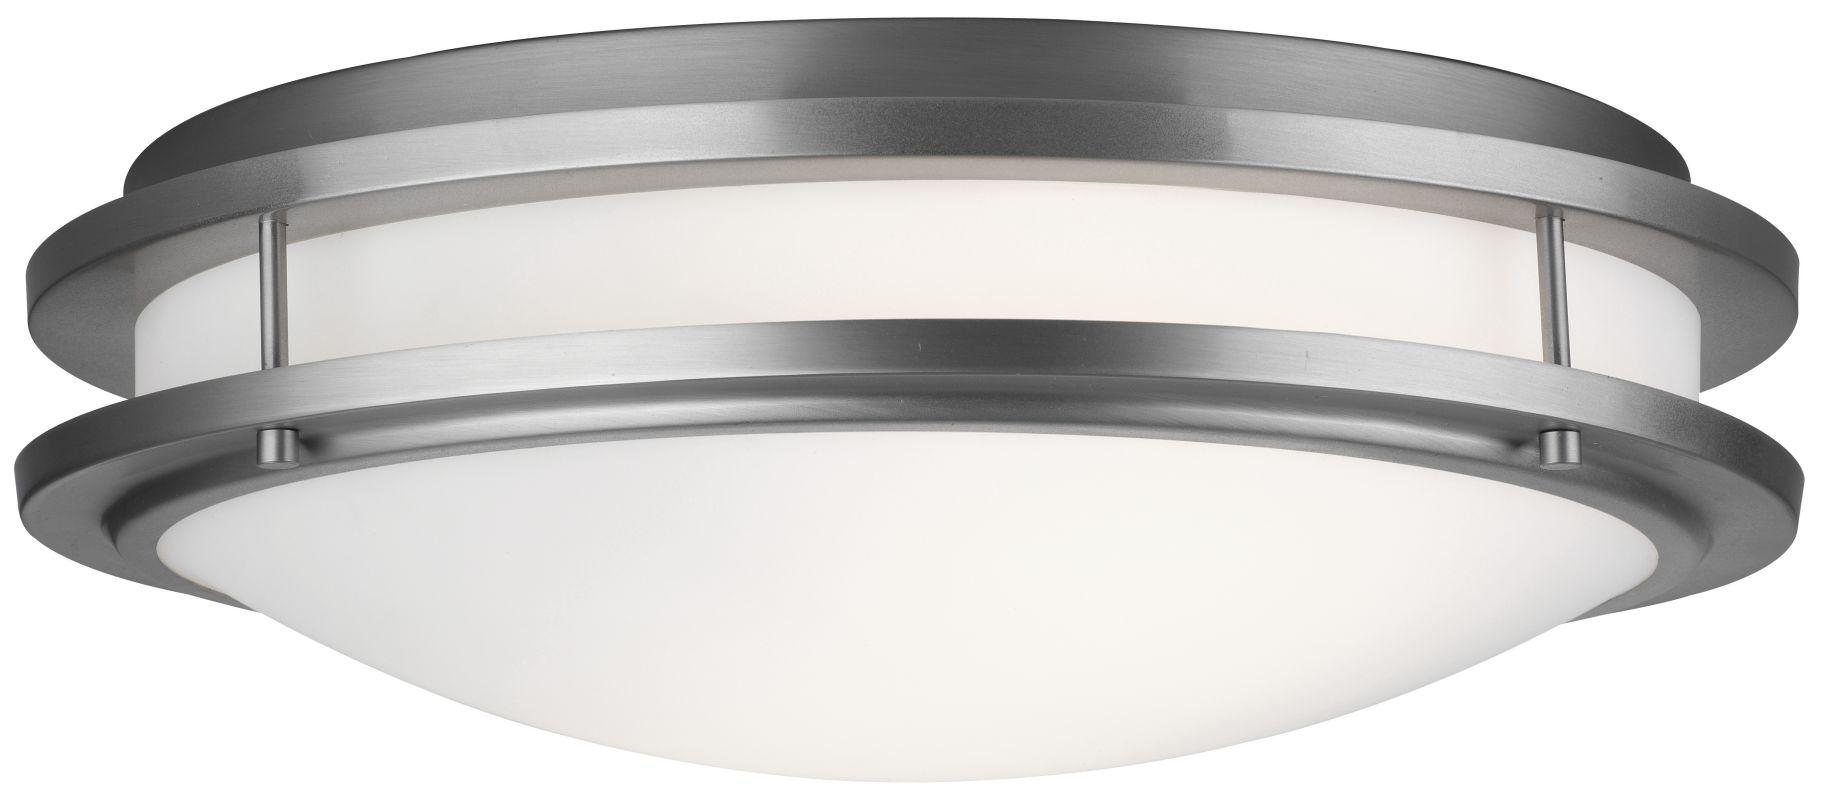 "Forecast Lighting F245736U 2 Light 18"" Wide Flush Mount Ceiling"